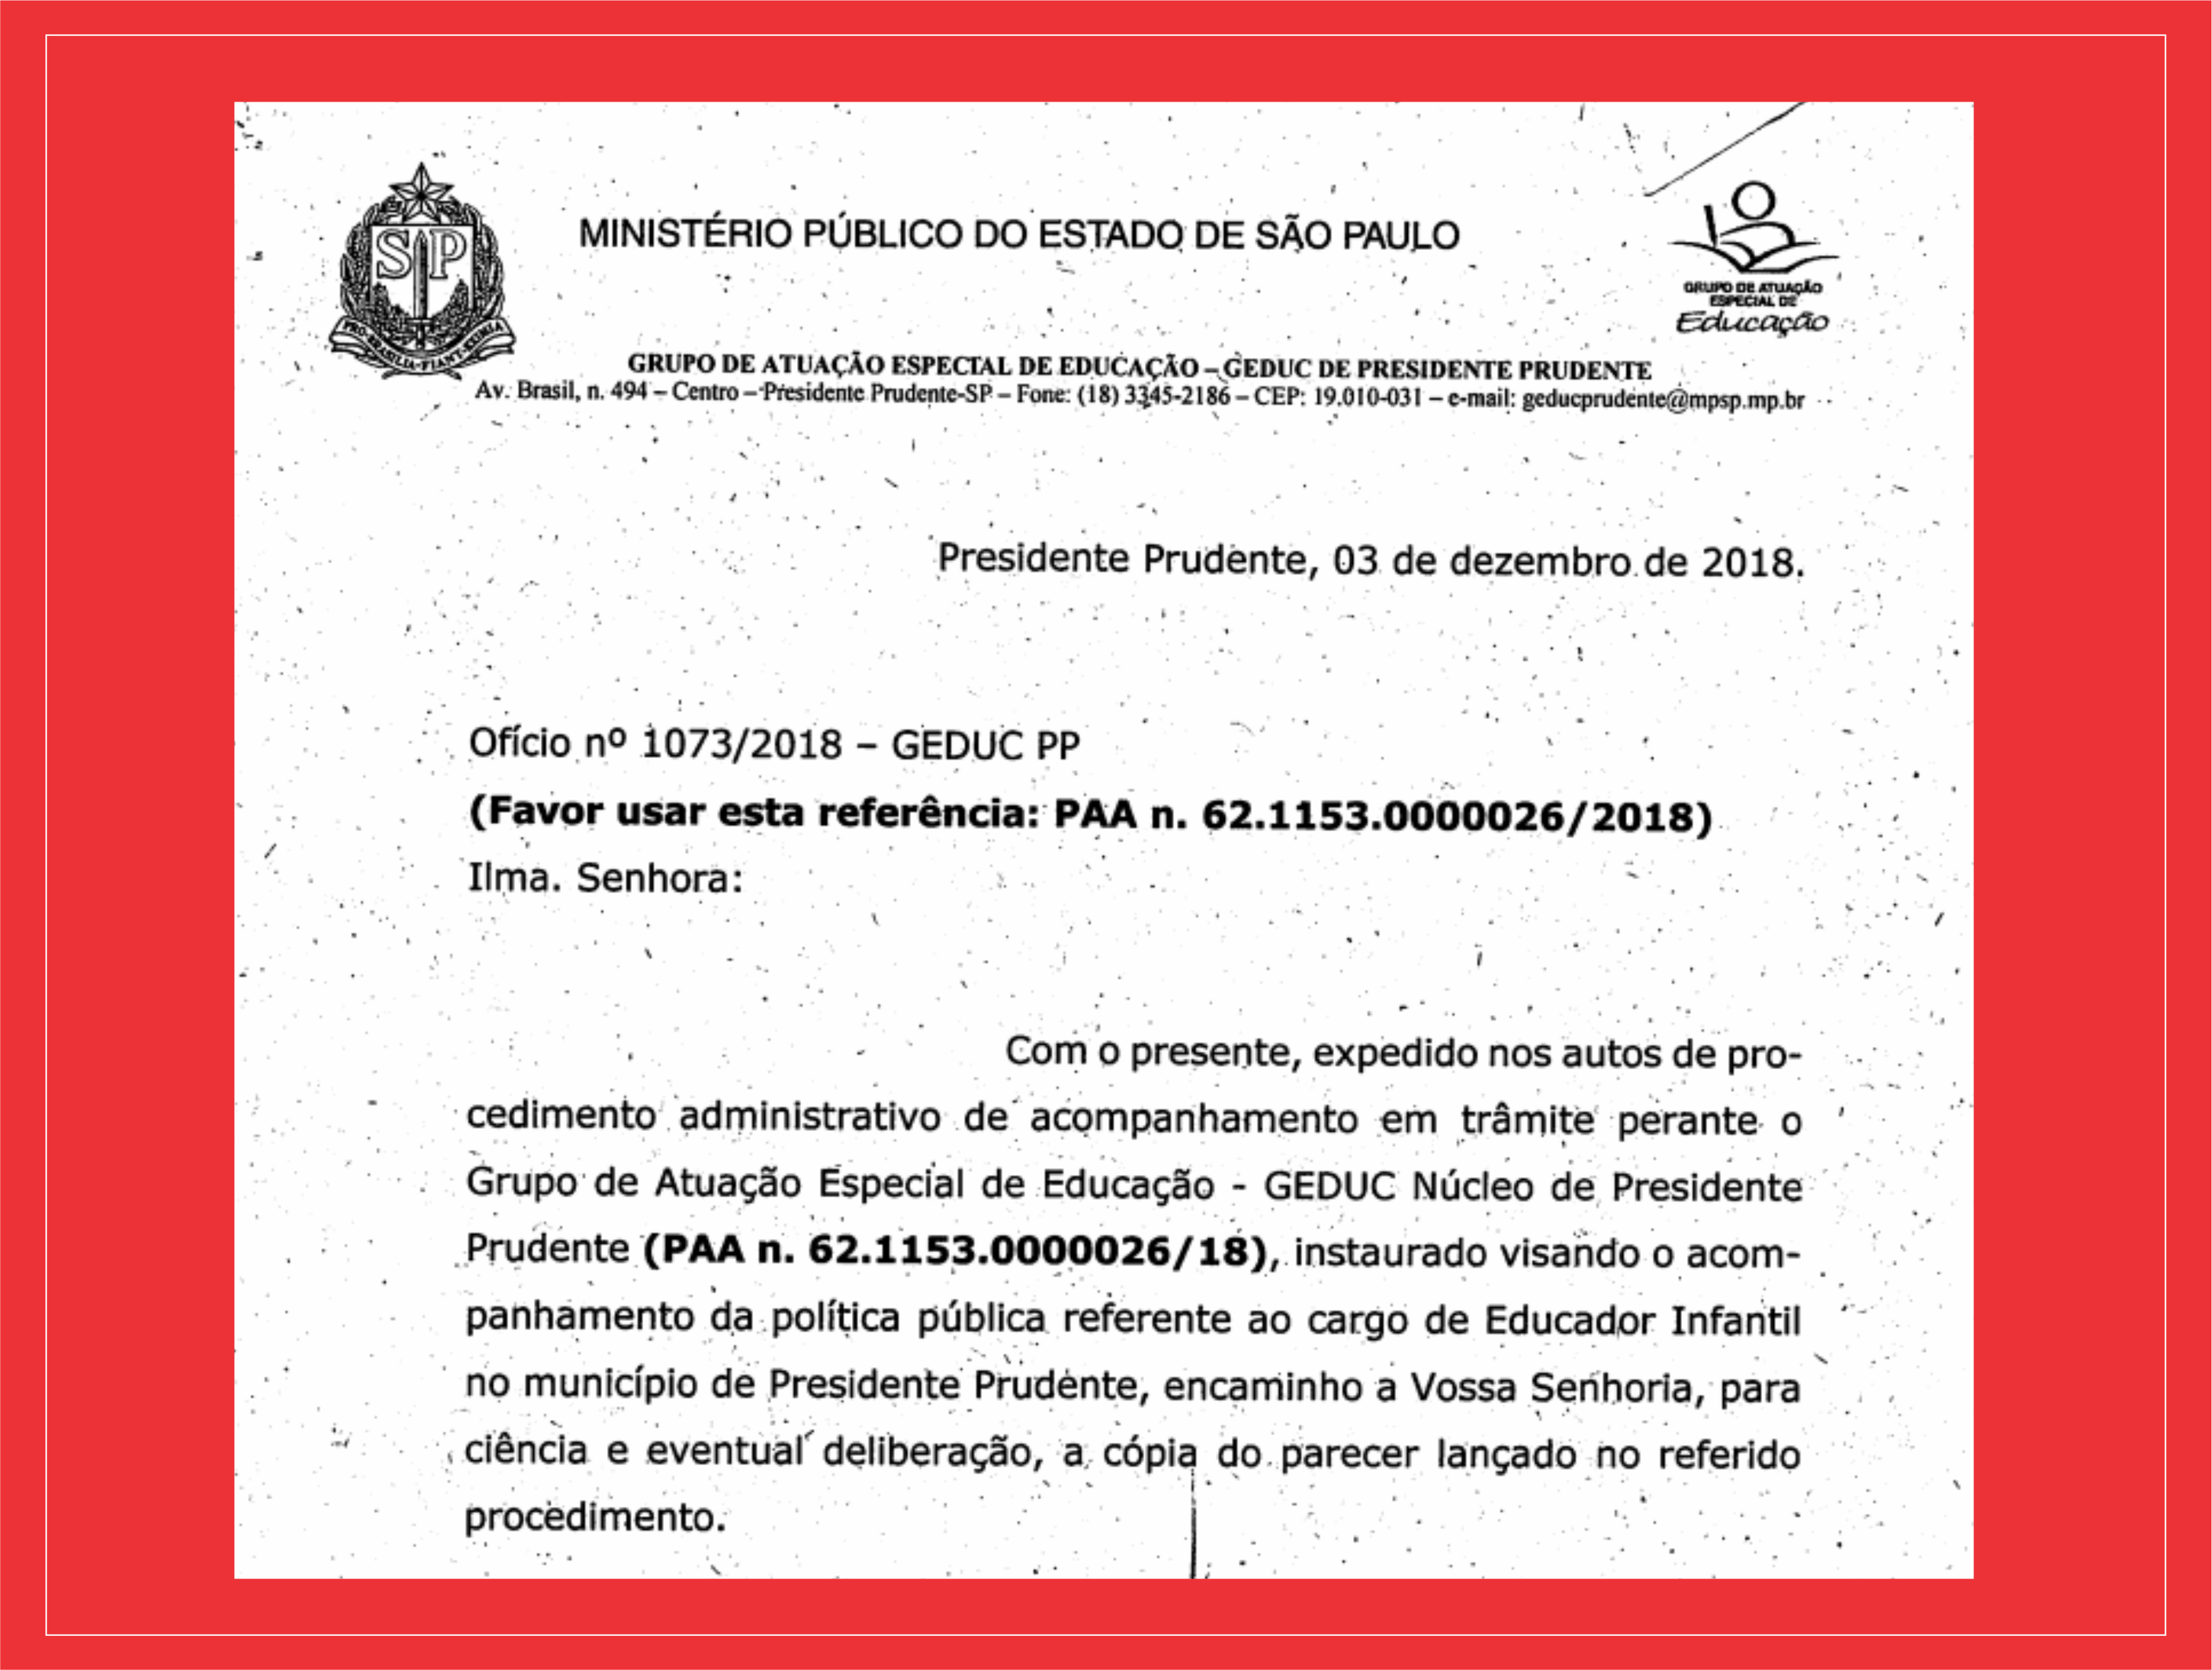 Sindicato recebe documento do Ministério Público acerca do cargo de Educador Infantil